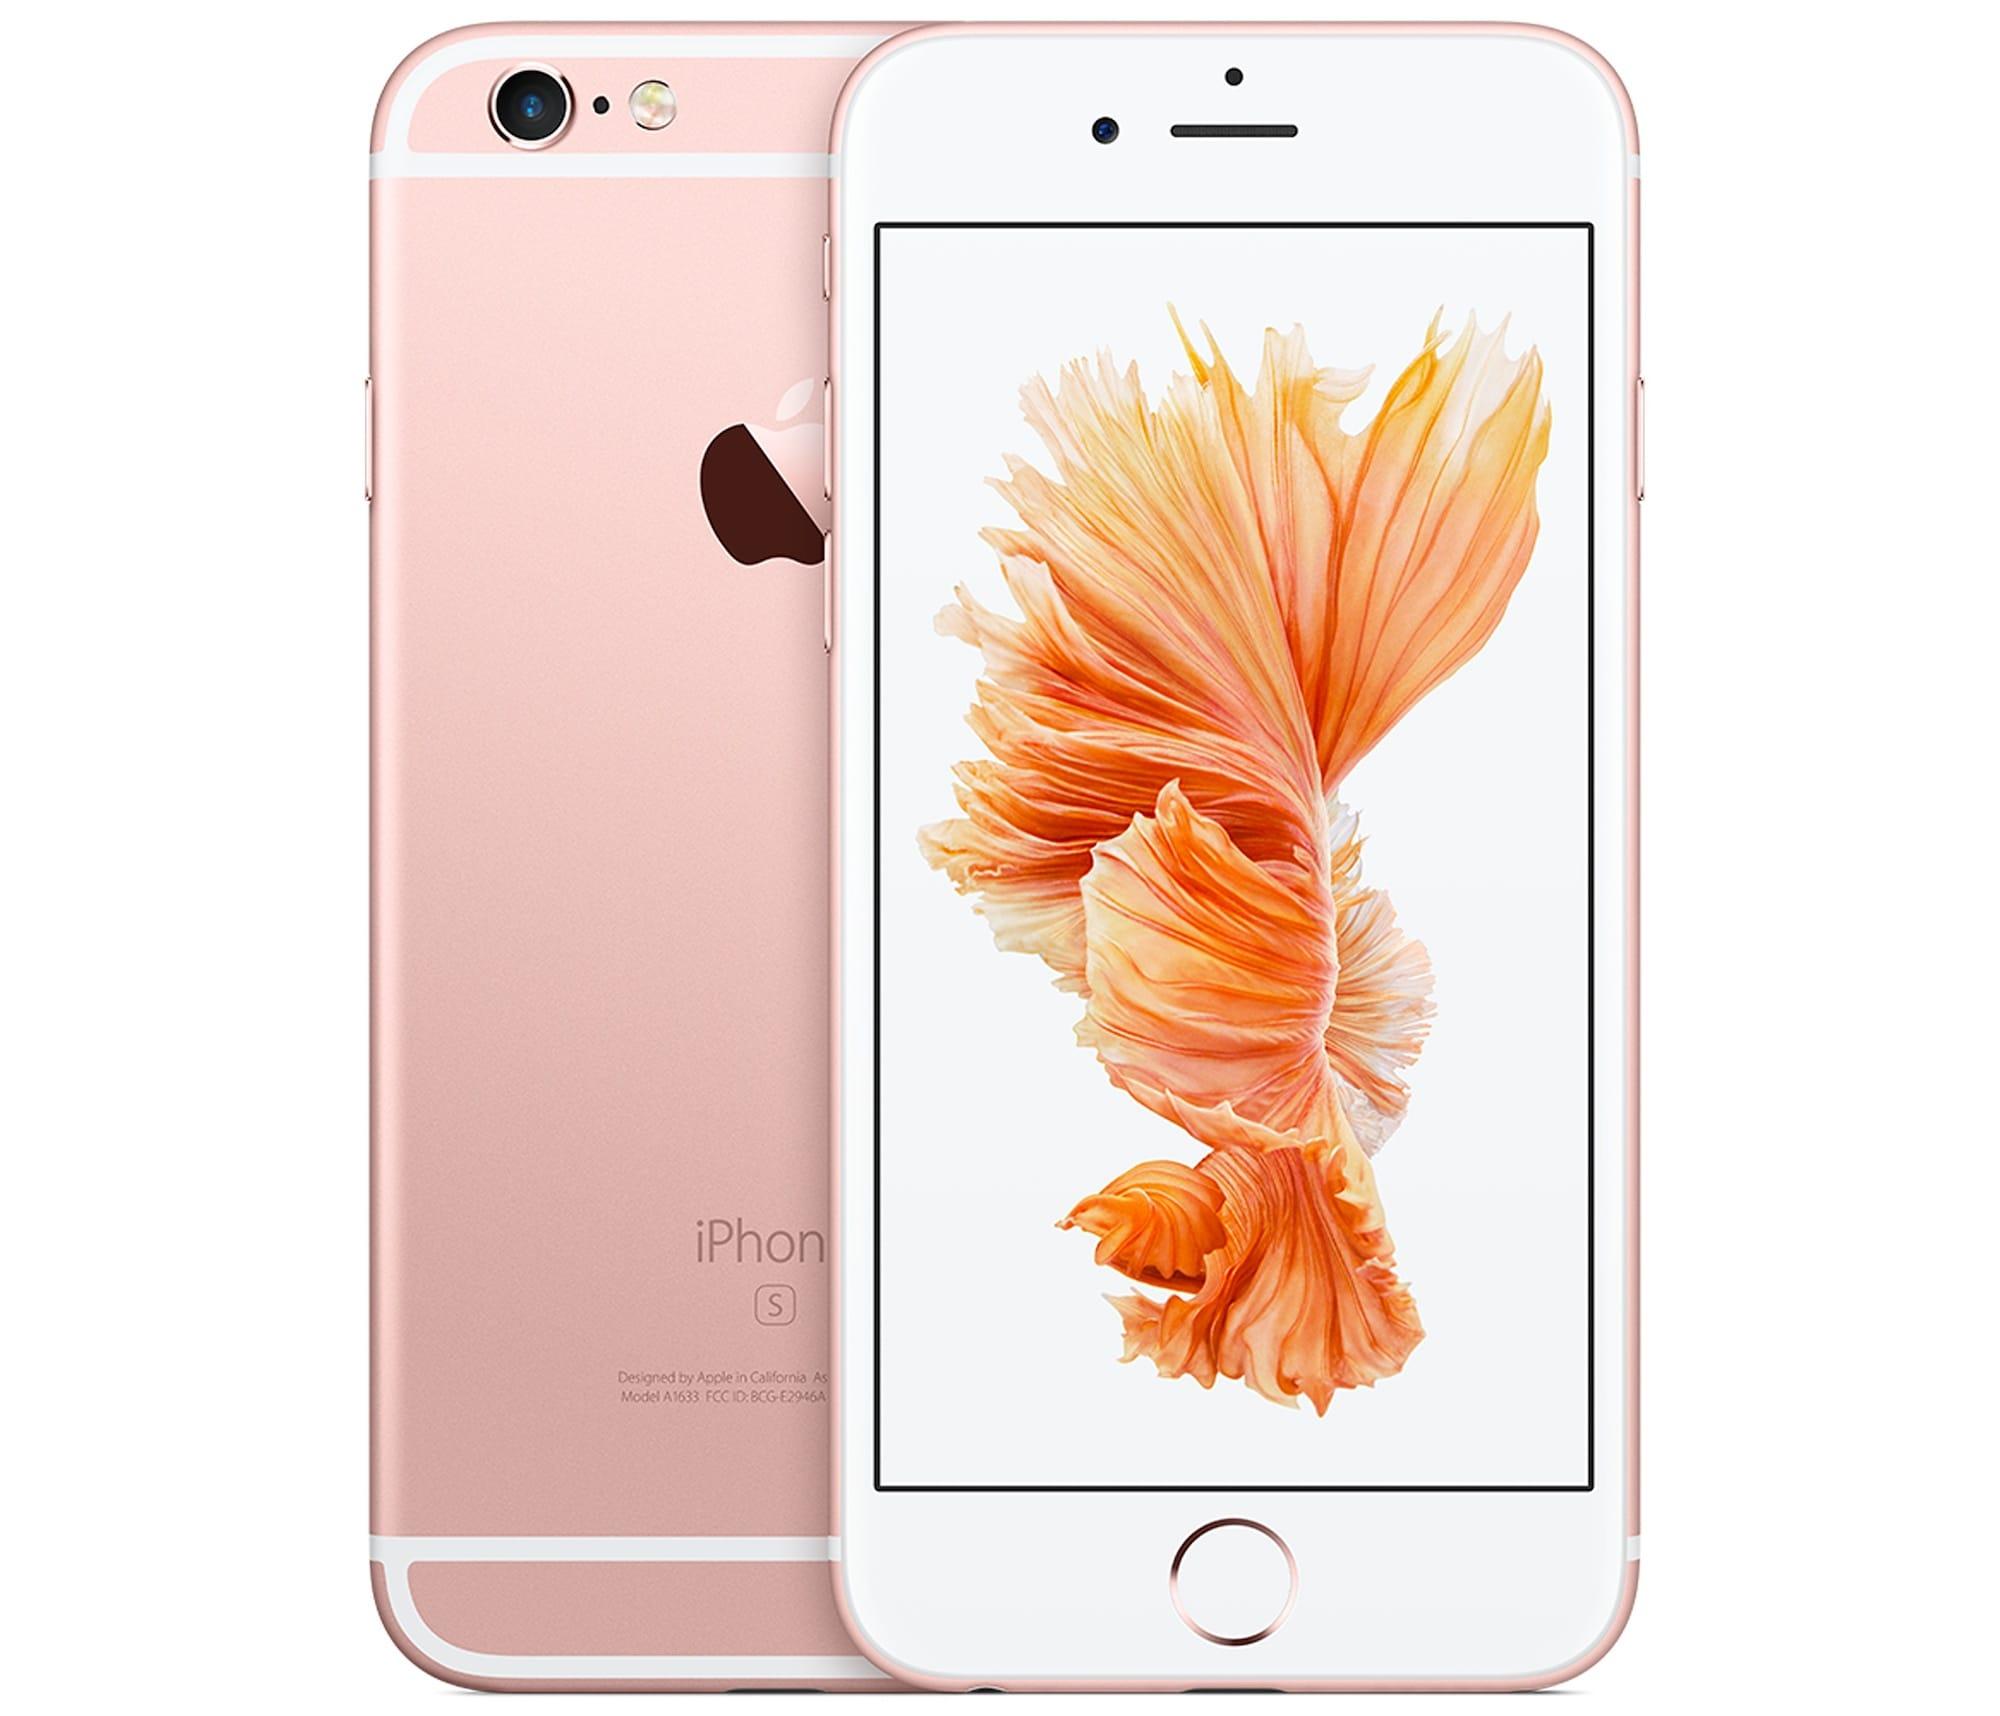 Цена iPhone 8 Plus в РФ наконец-то рухнула ниже психологической отметки